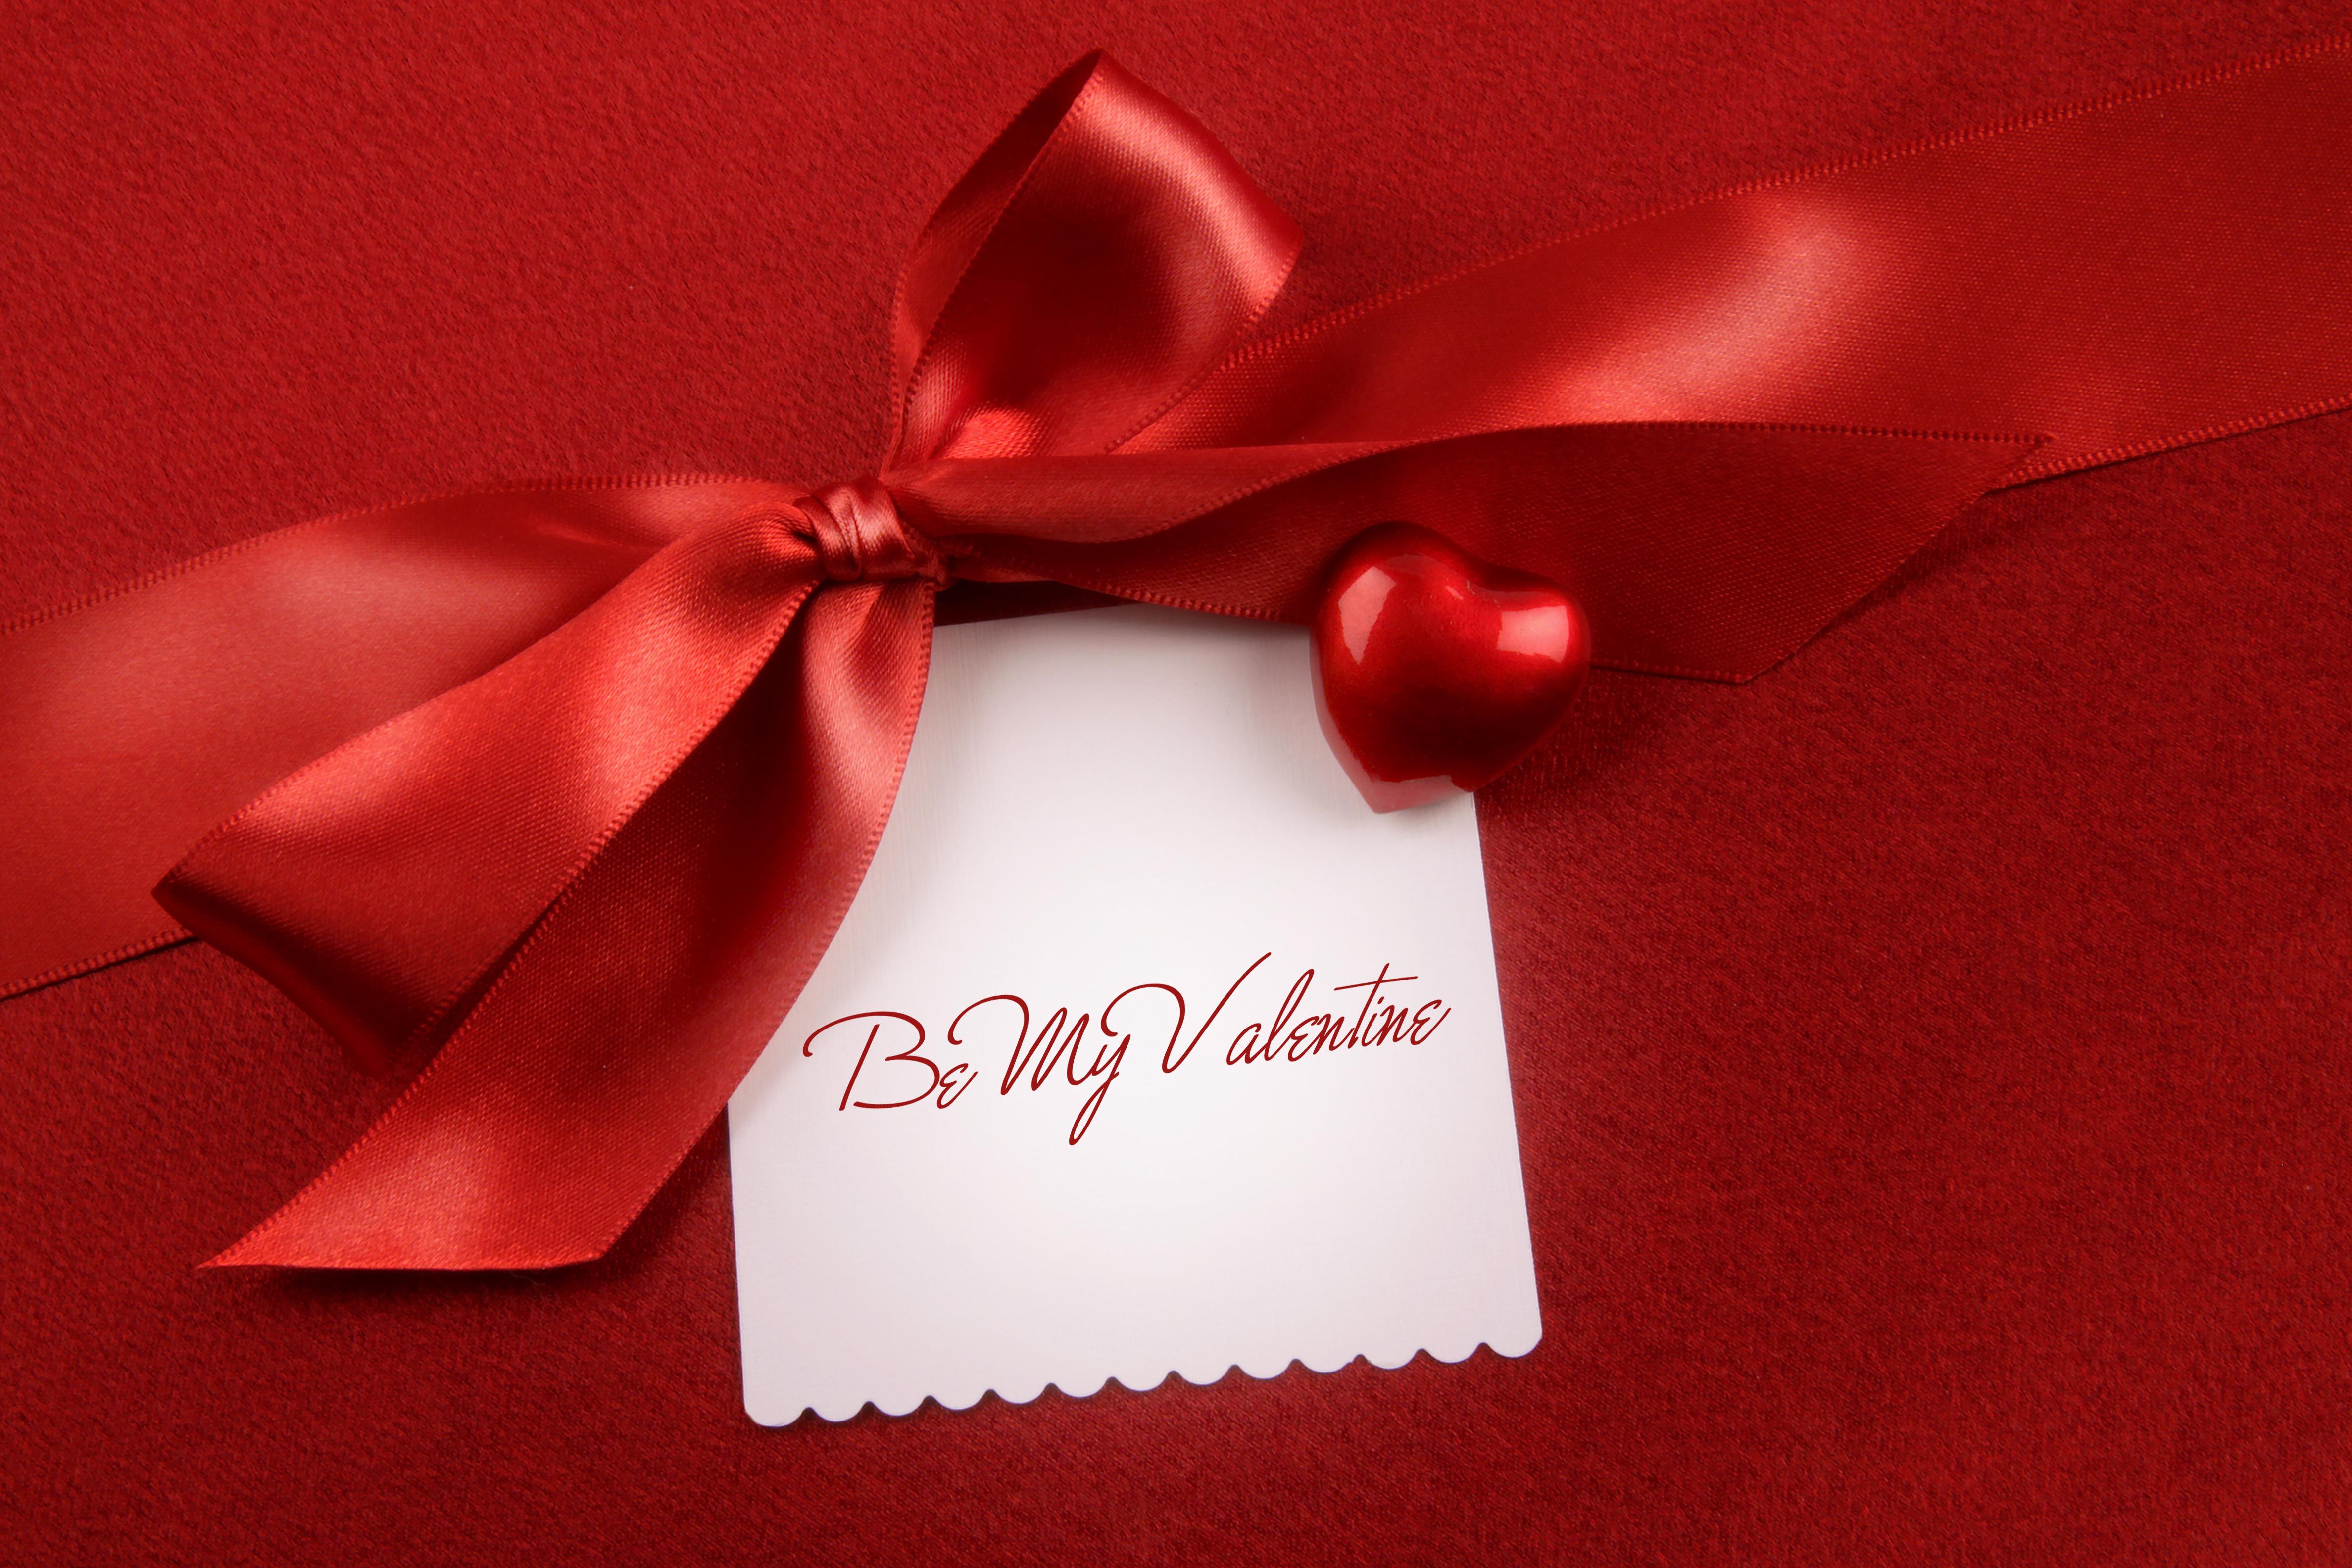 открытка с днем святого валентина фото любимому межплиточного шва один